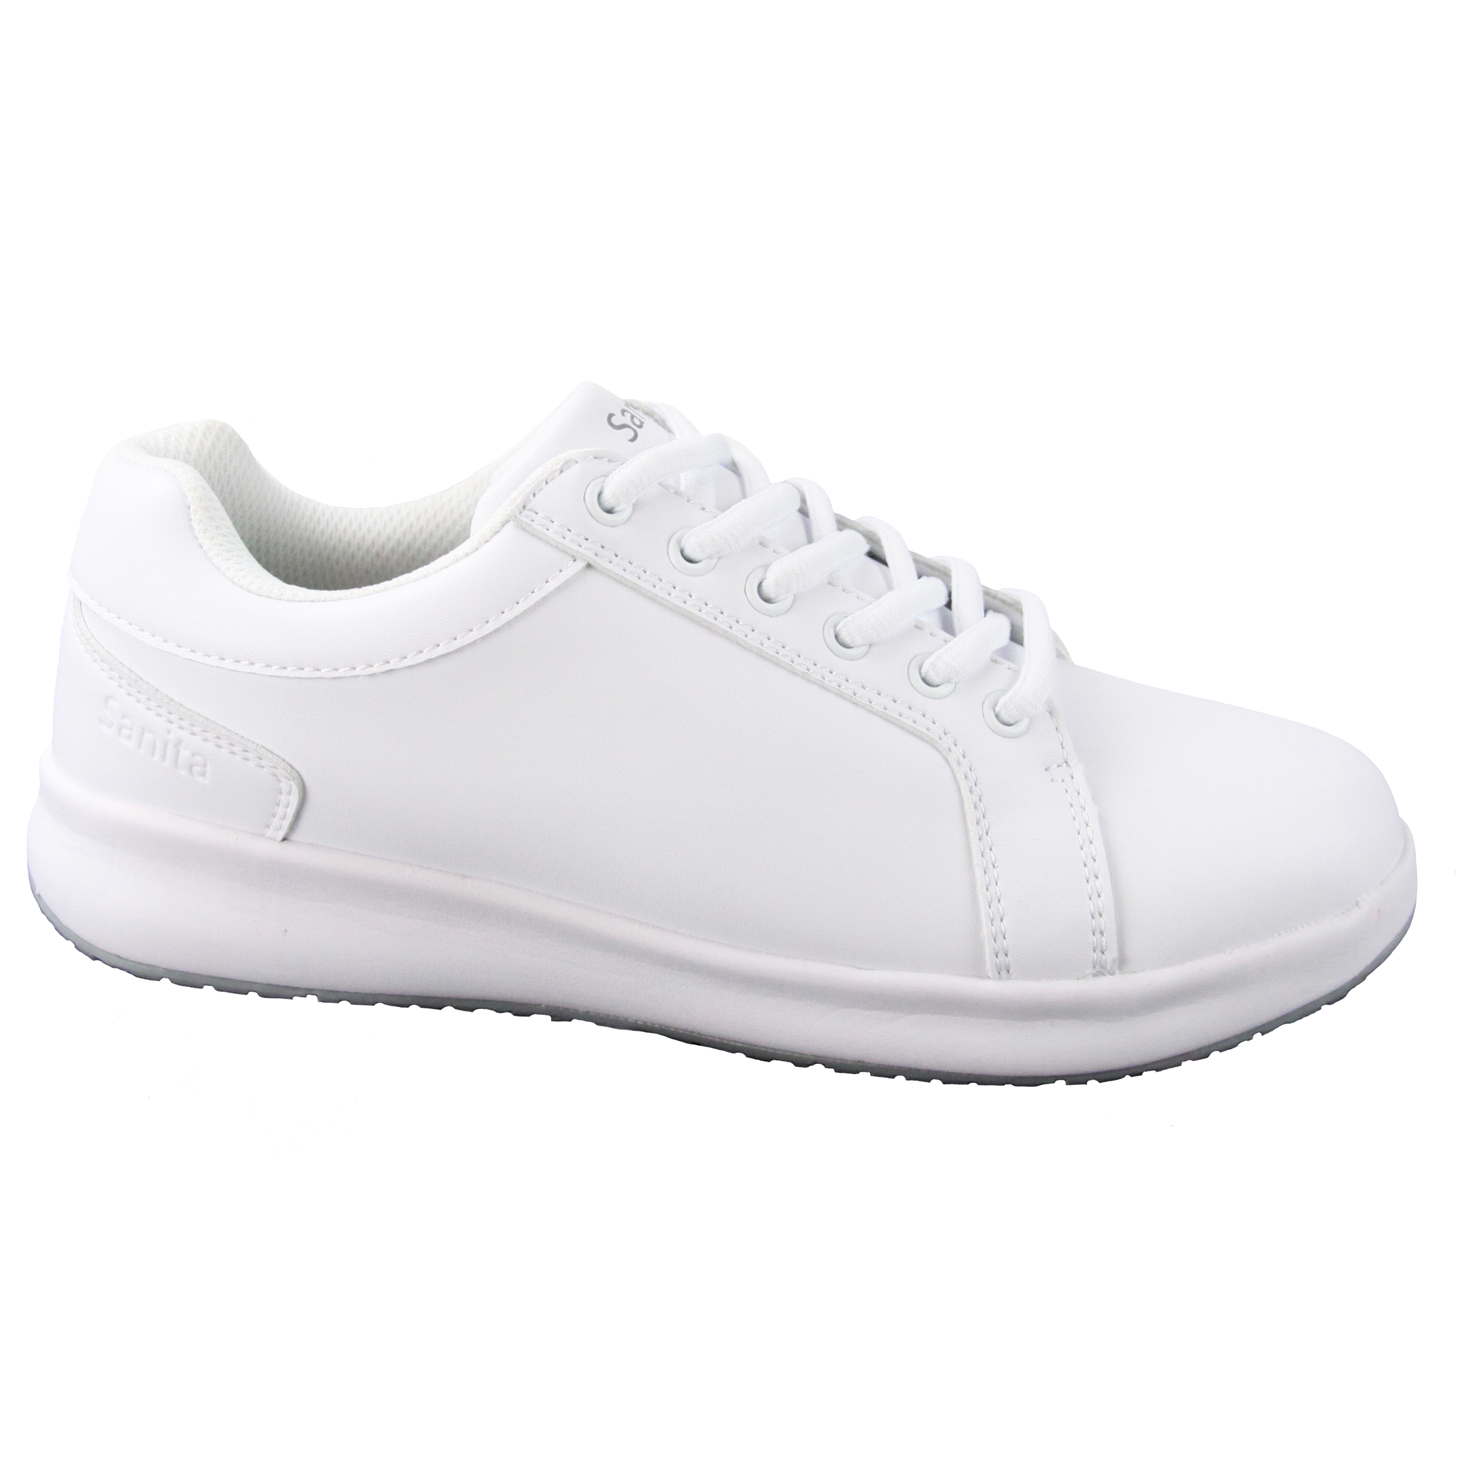 KITE Unisex Safety Sneaker